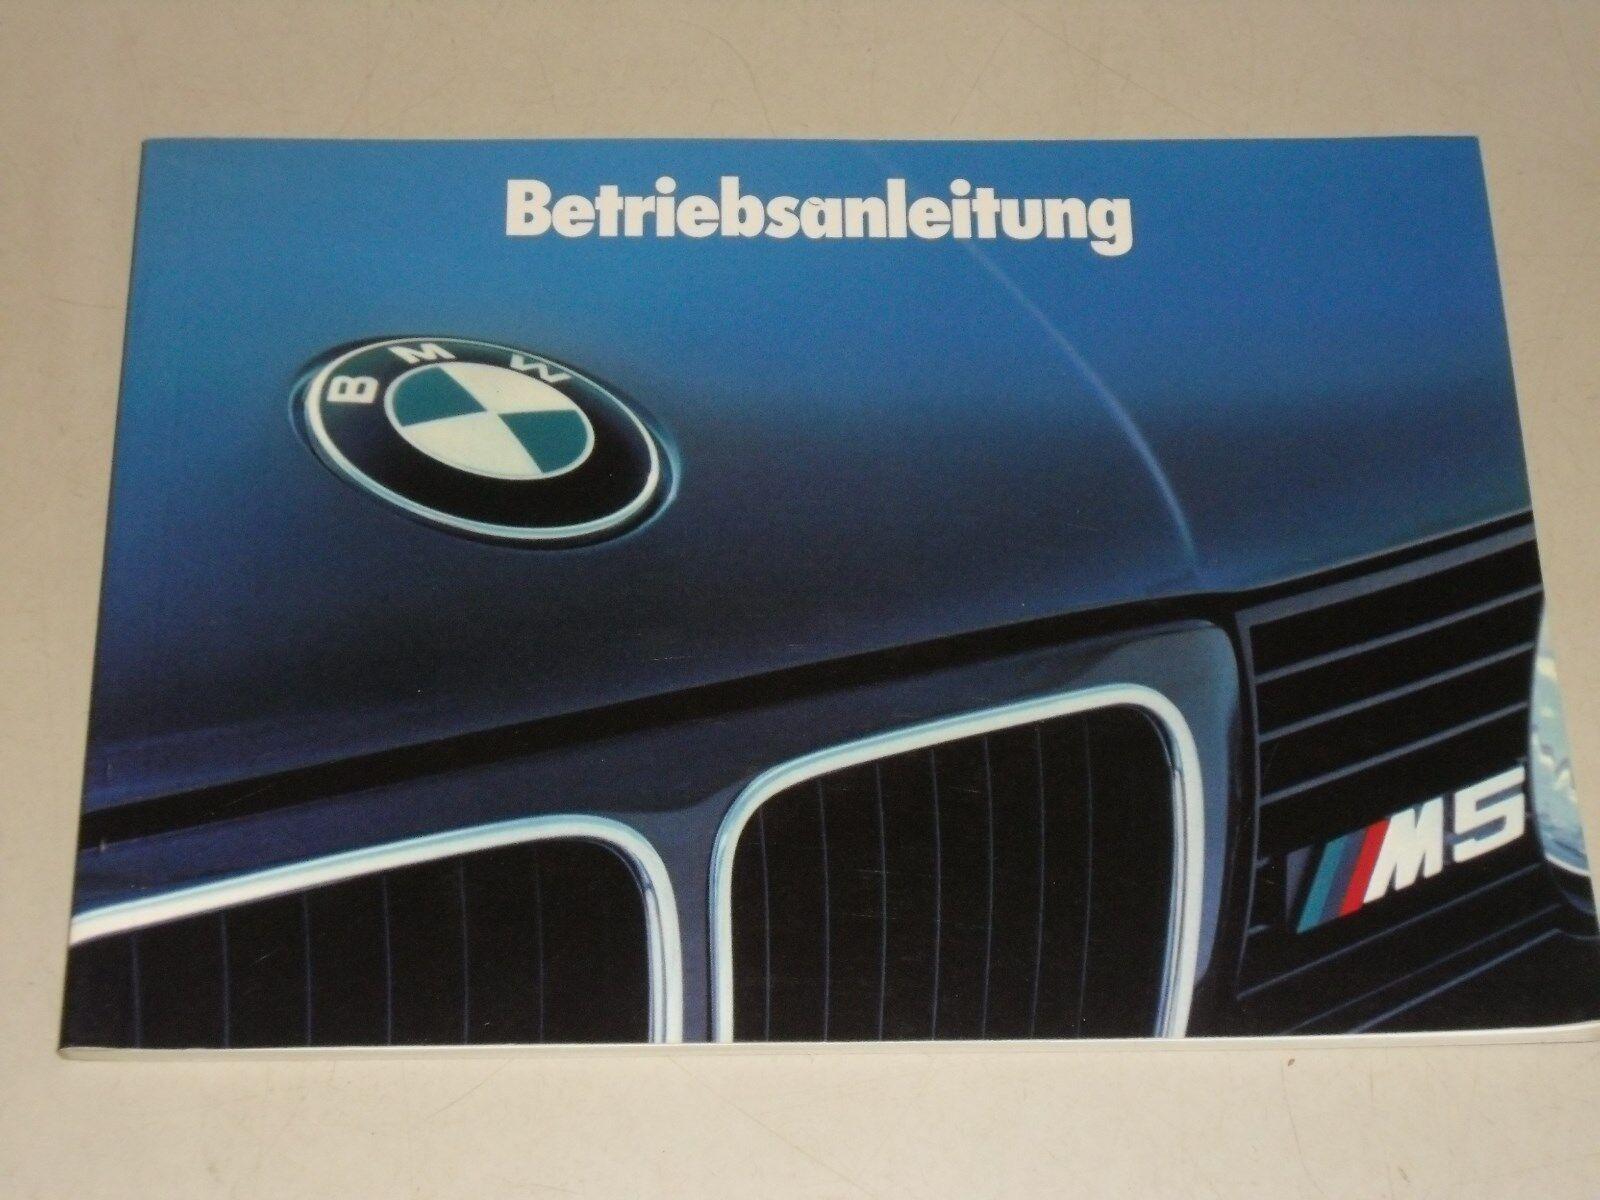 Operating Instructions Handbook BMW Motorsport 5er Reihe E34 M5, Stand 08 1990